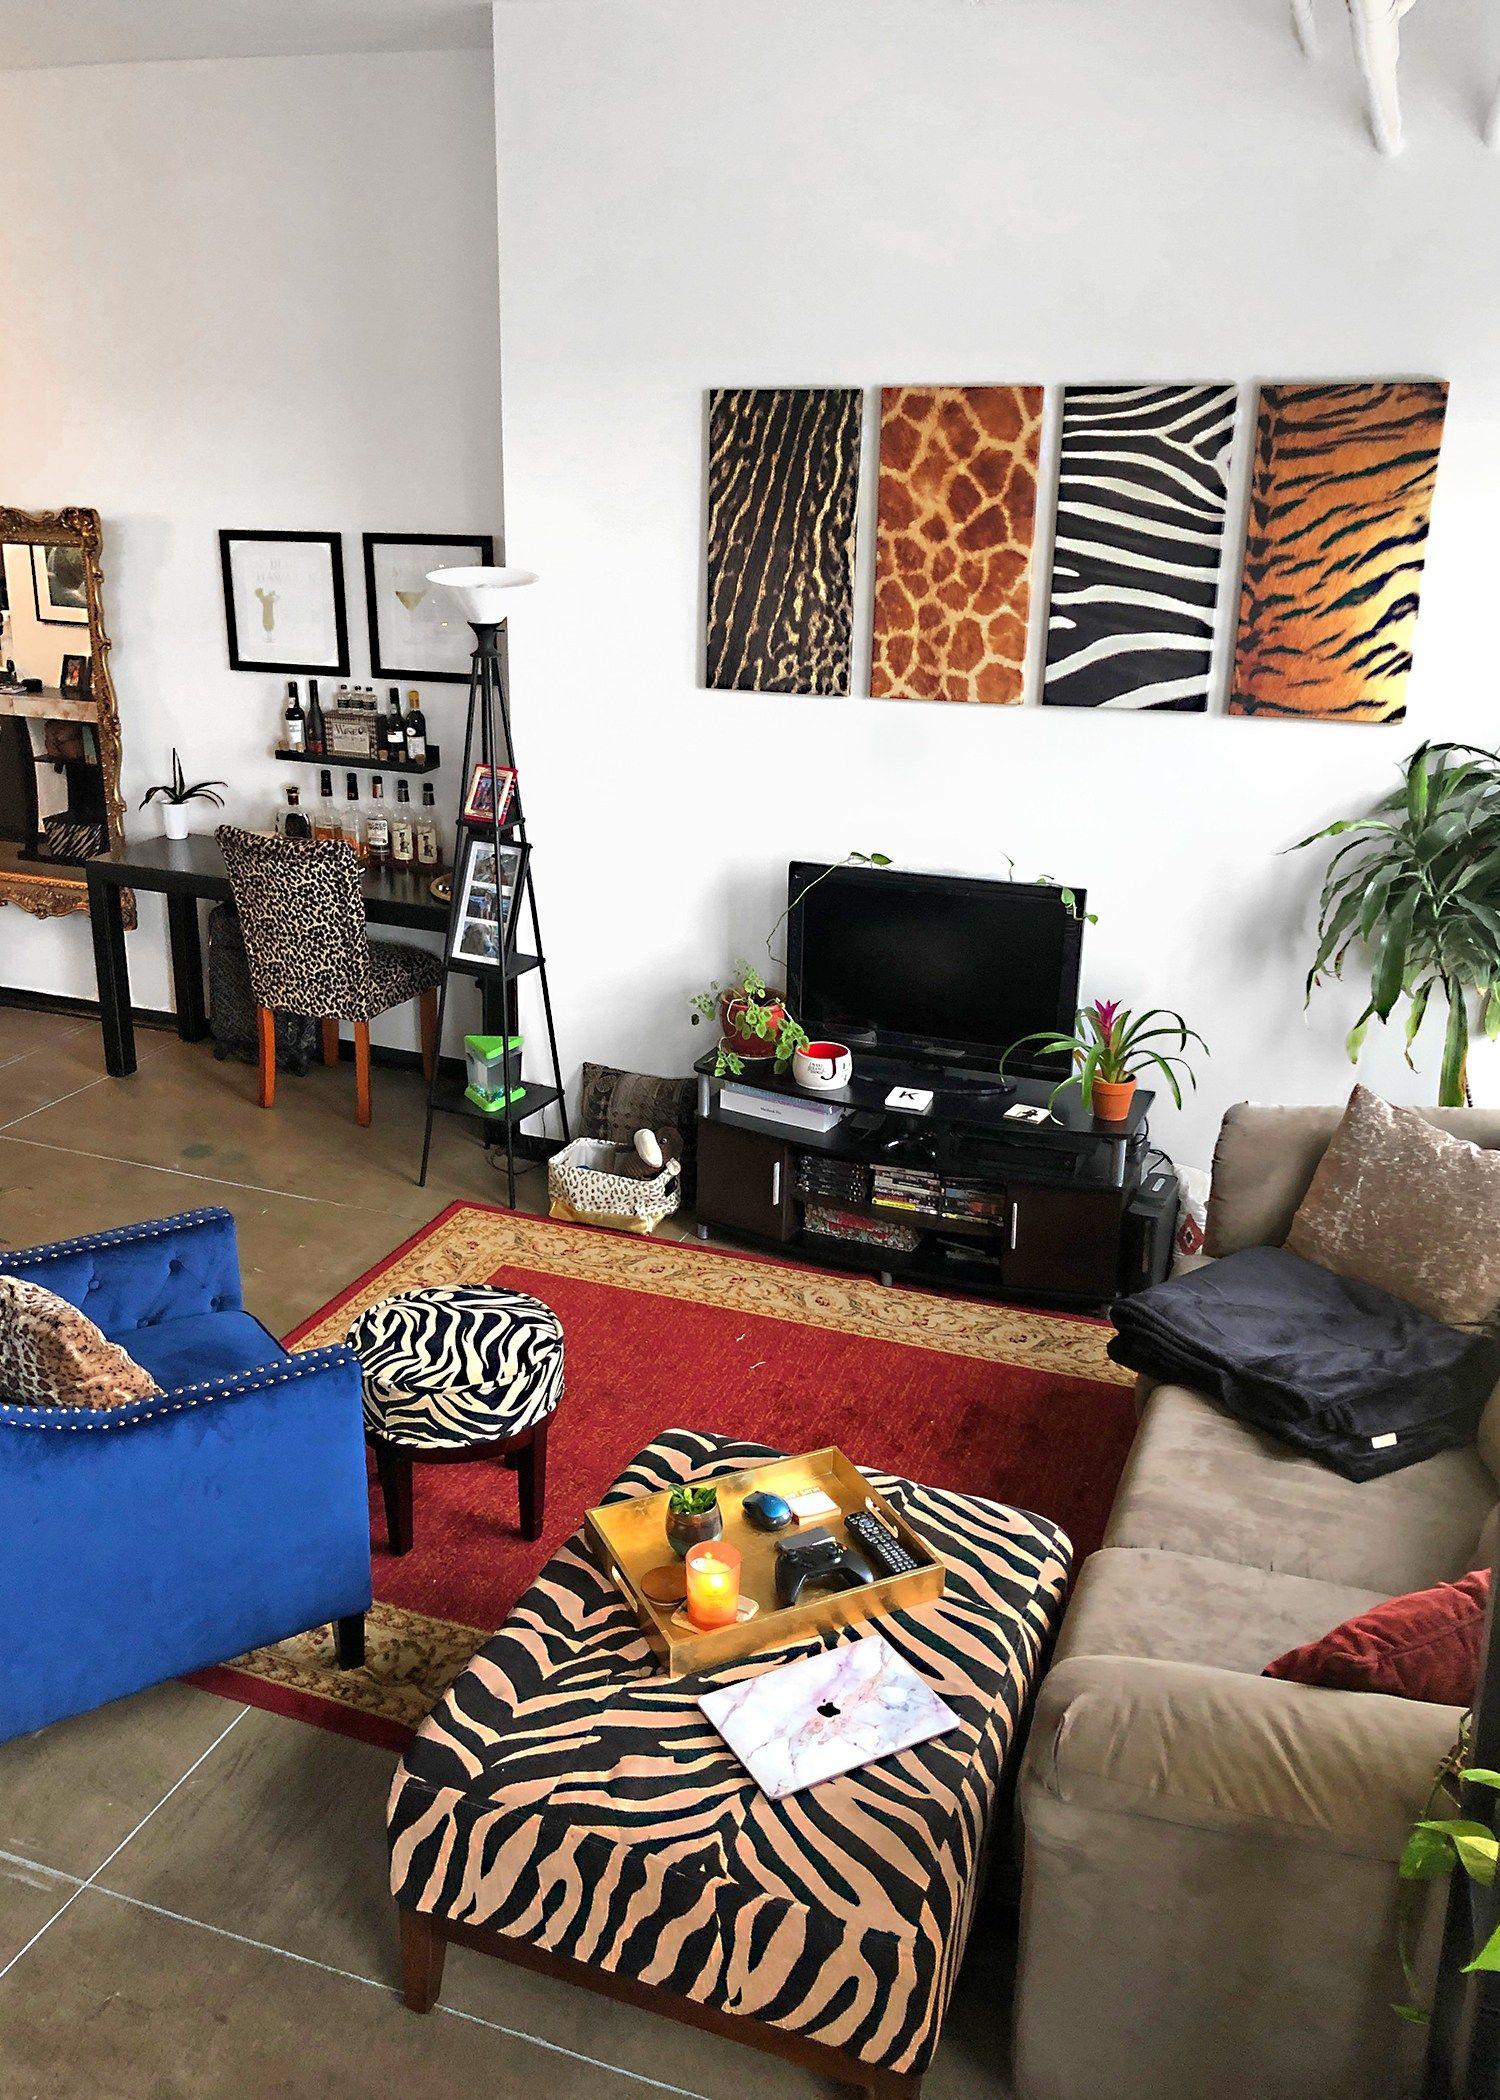 My Apartment Decor Tour Katey Blaire In 2020 Apartment Decor Apartment Decor Inspiration Apartment Interior Design